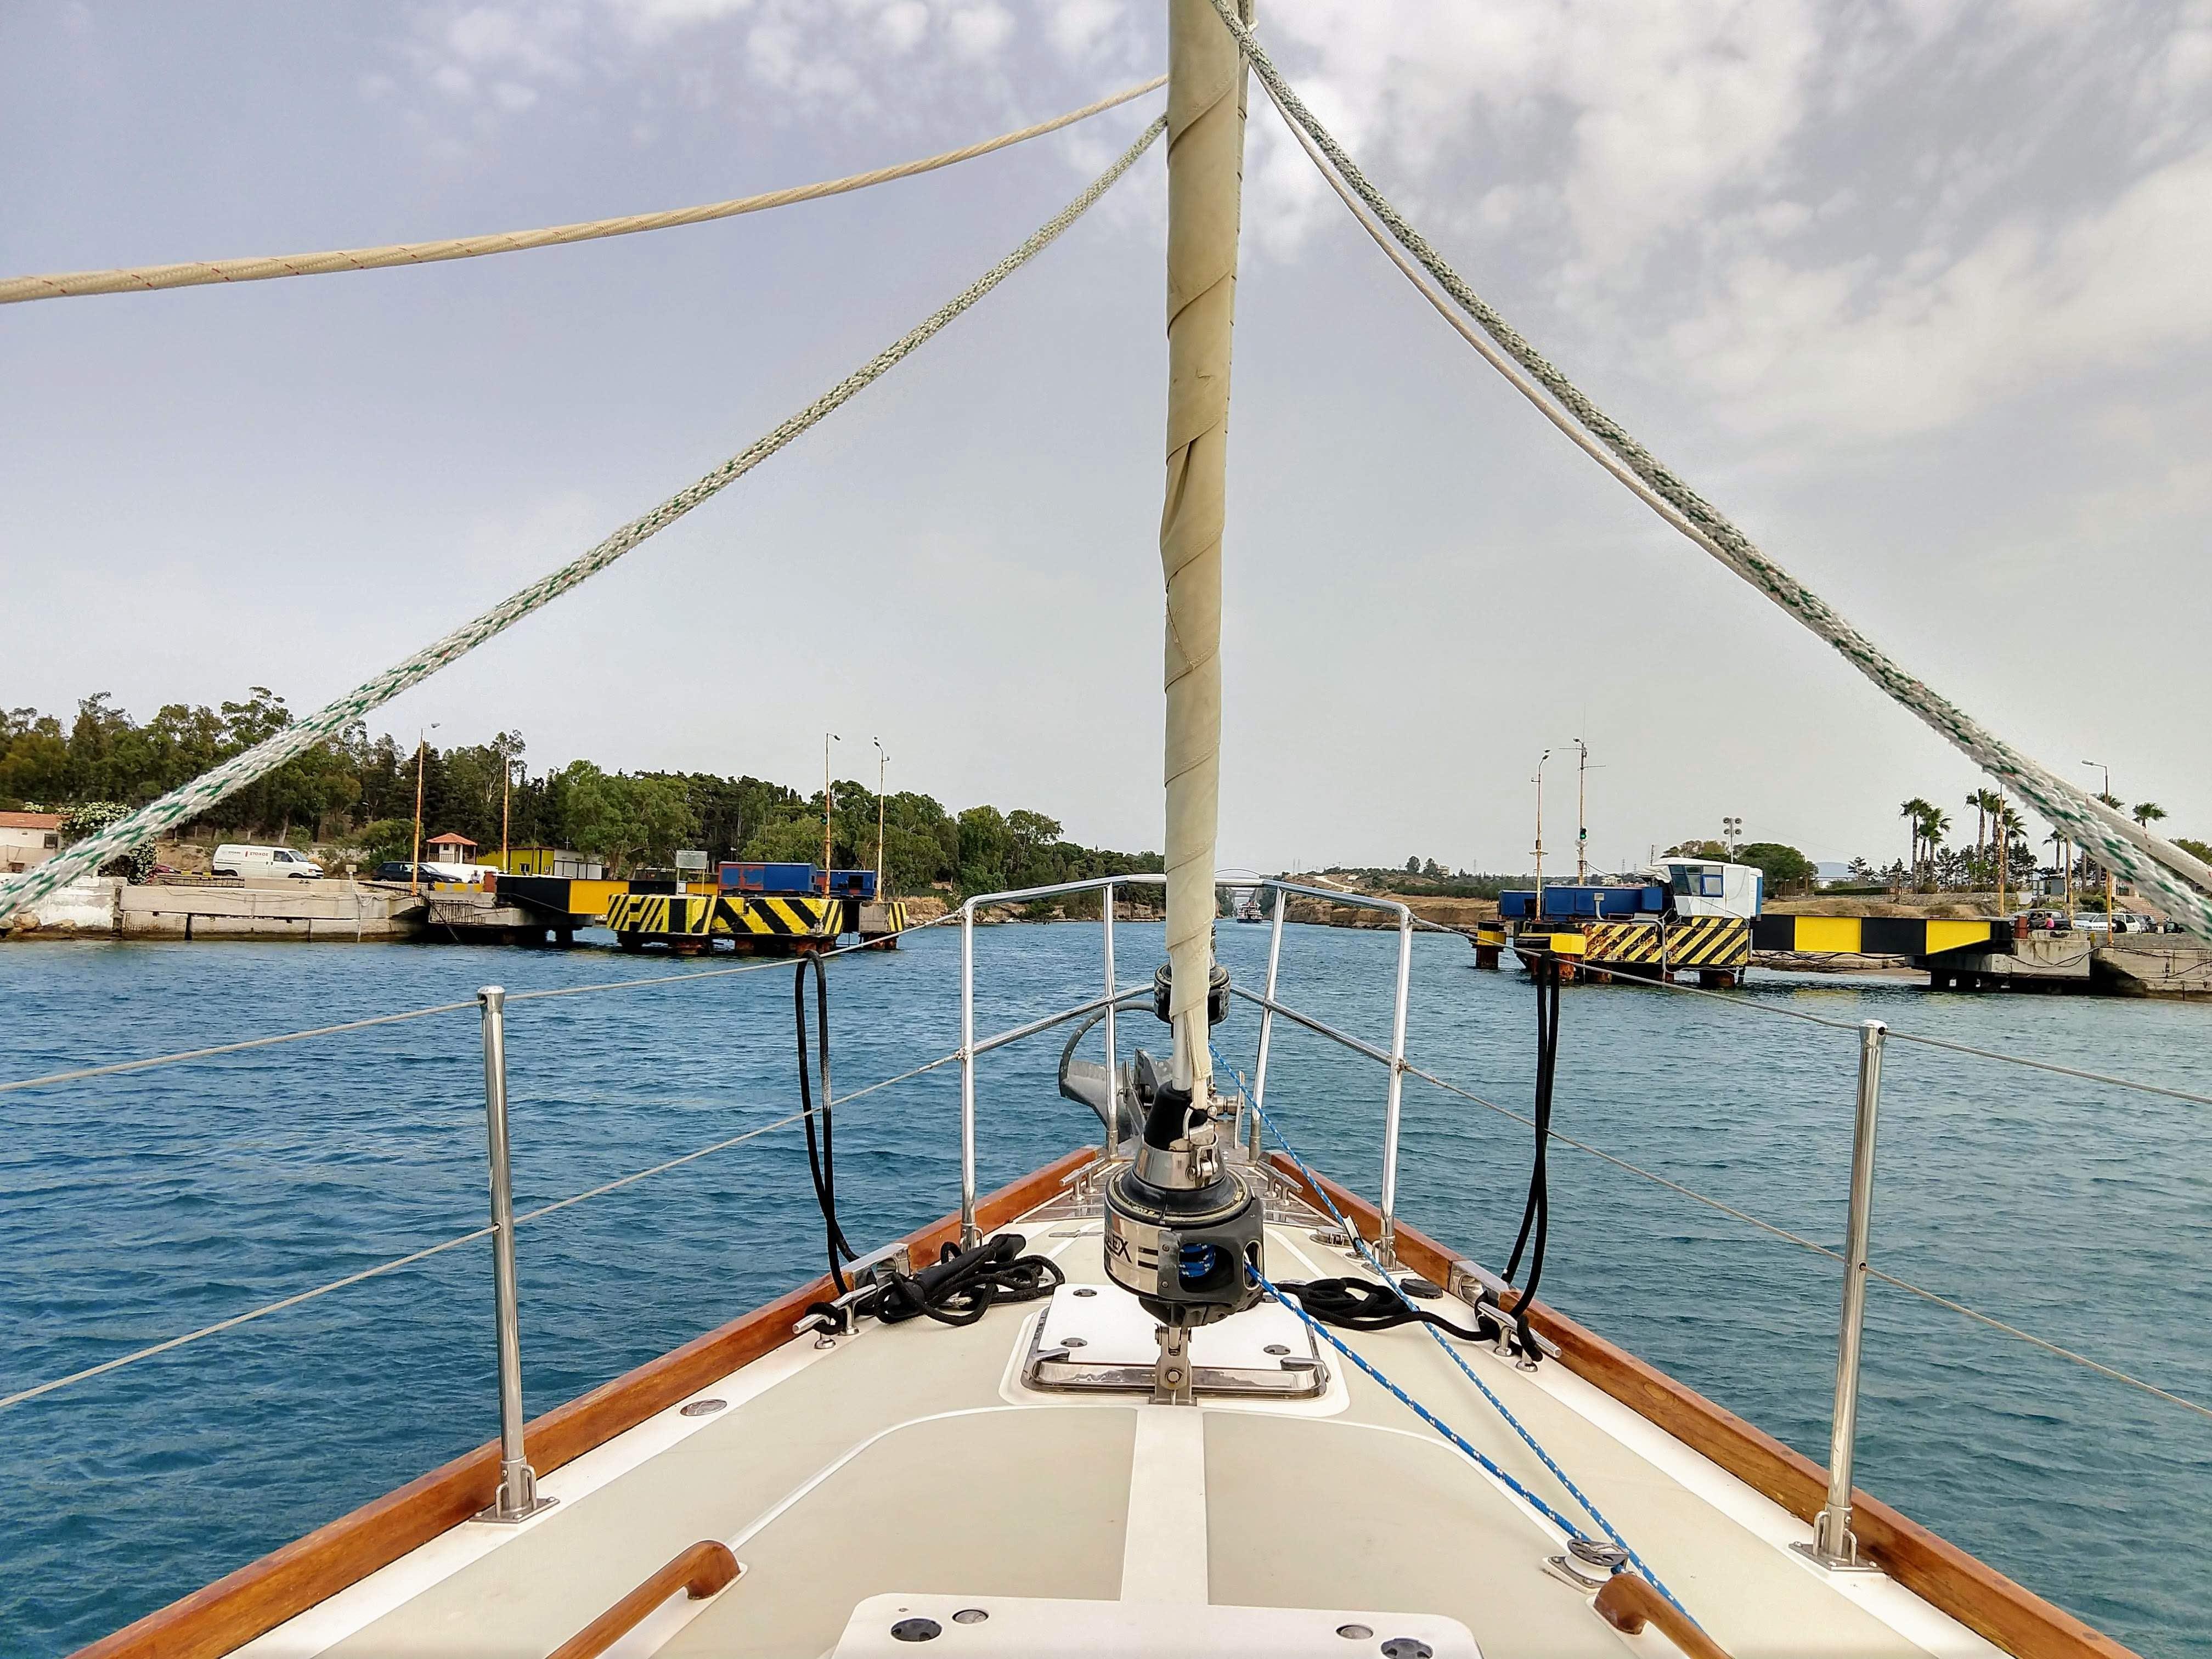 https://www.sailblogs.com/sbgallery/pics/ggcunning_gmail_com/sbd78ztnx/Corinth%20Canal%20Entrance.jpg